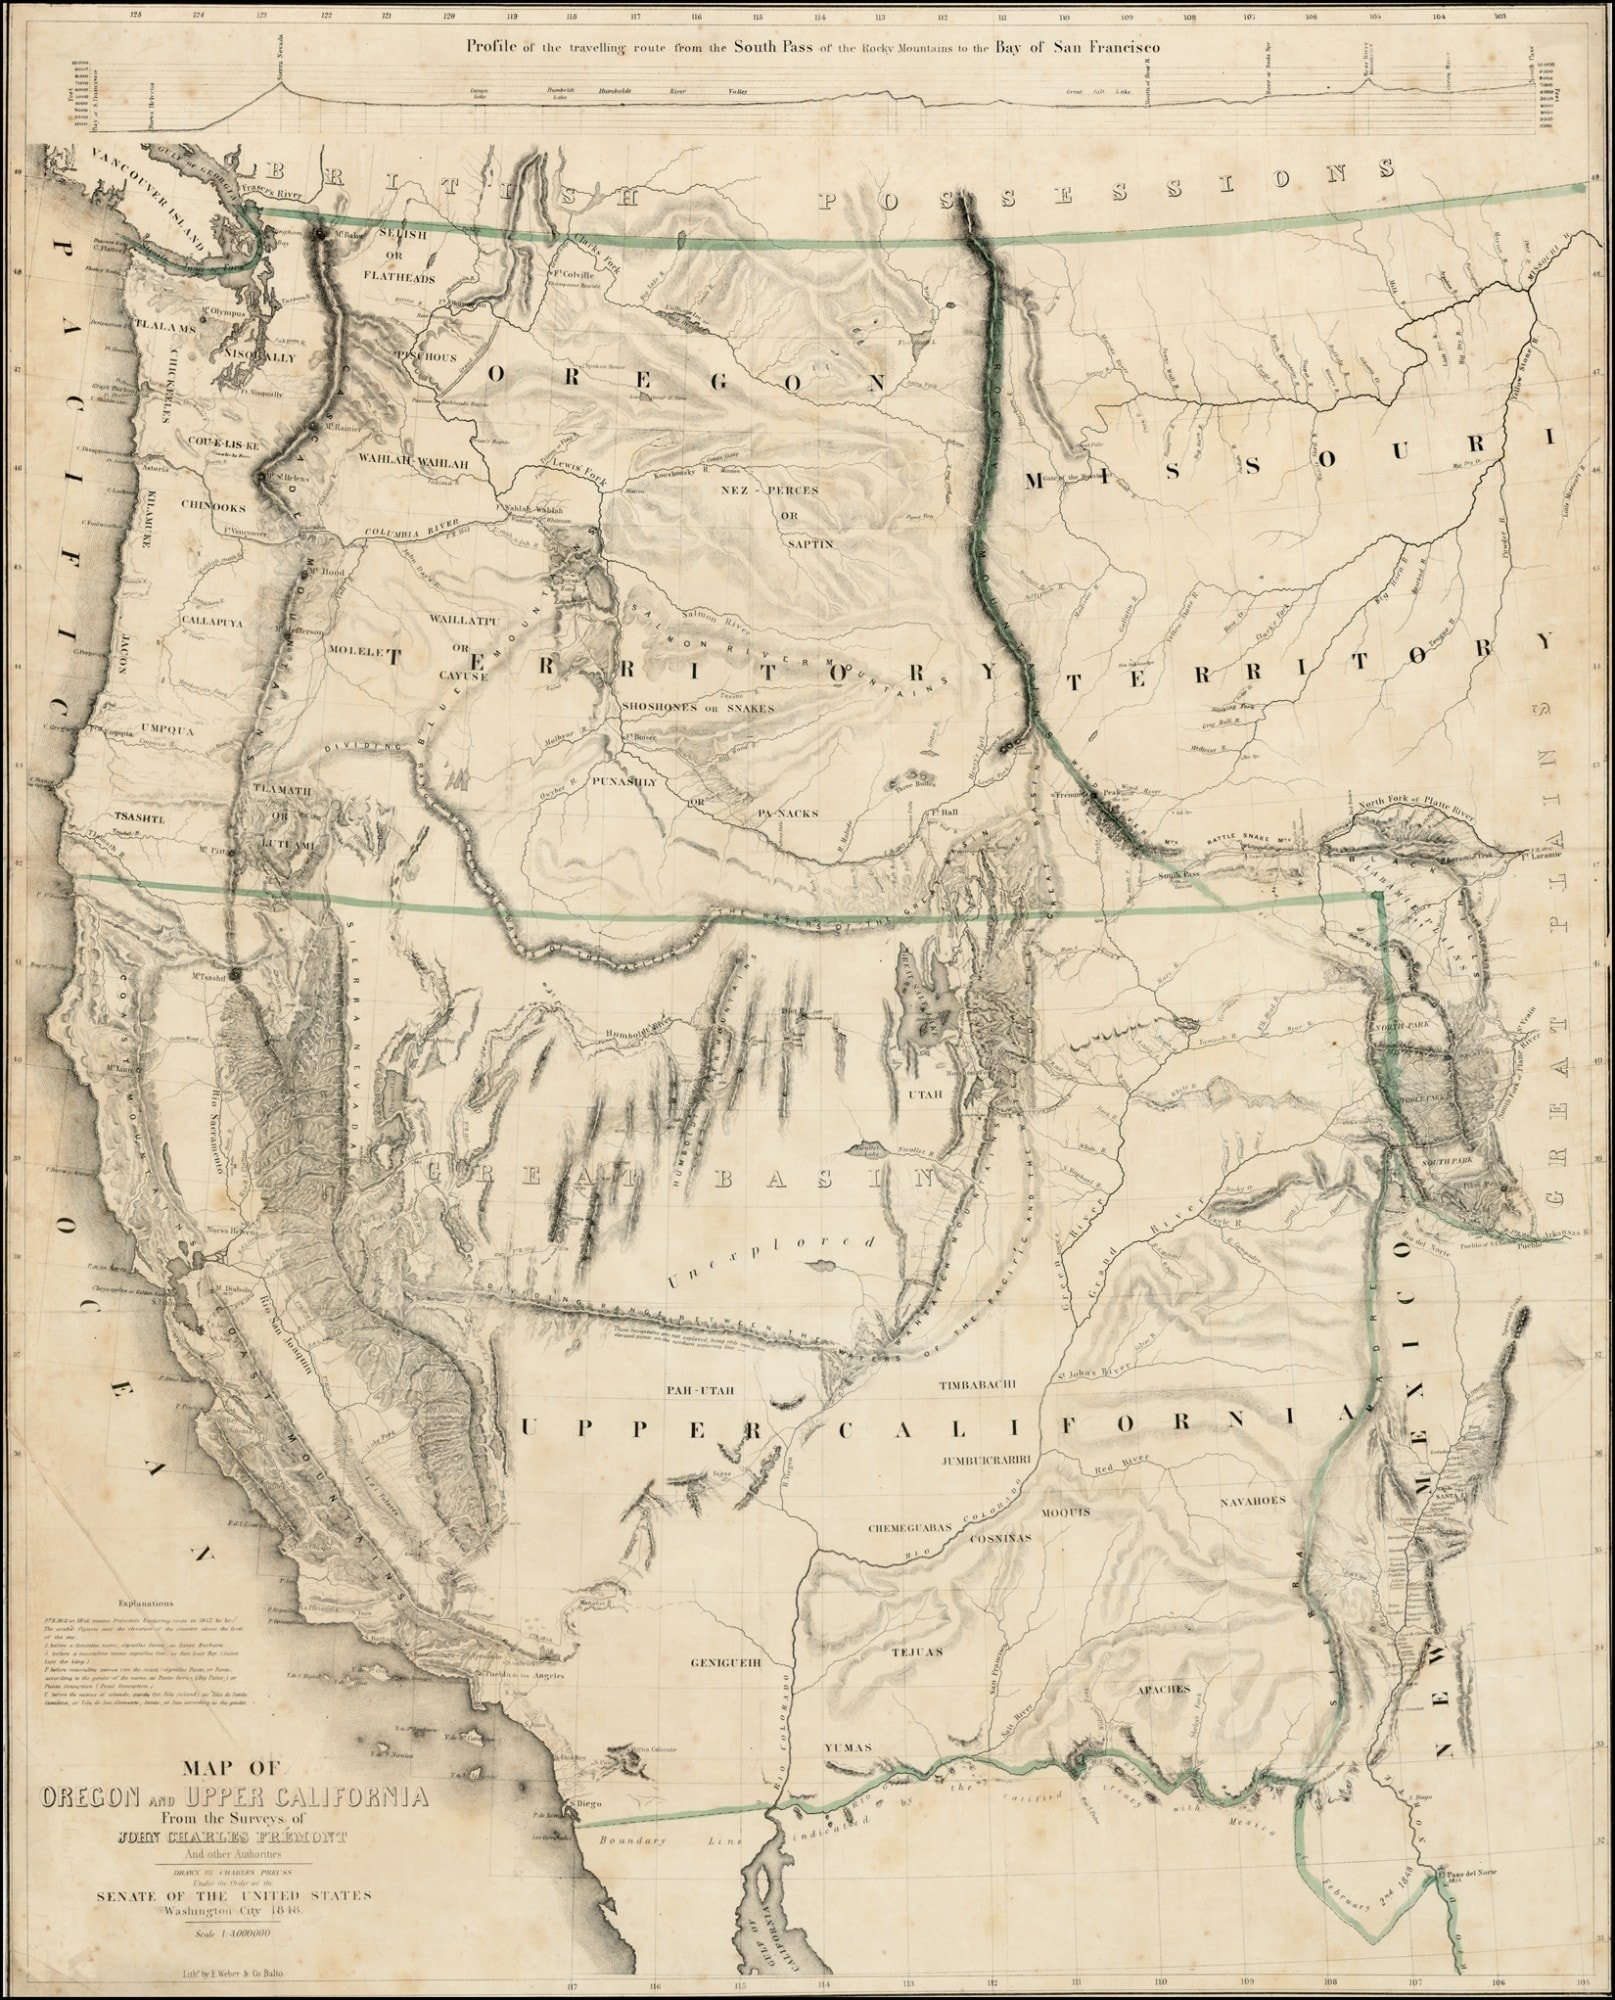 A Classic California Gold Rush Map